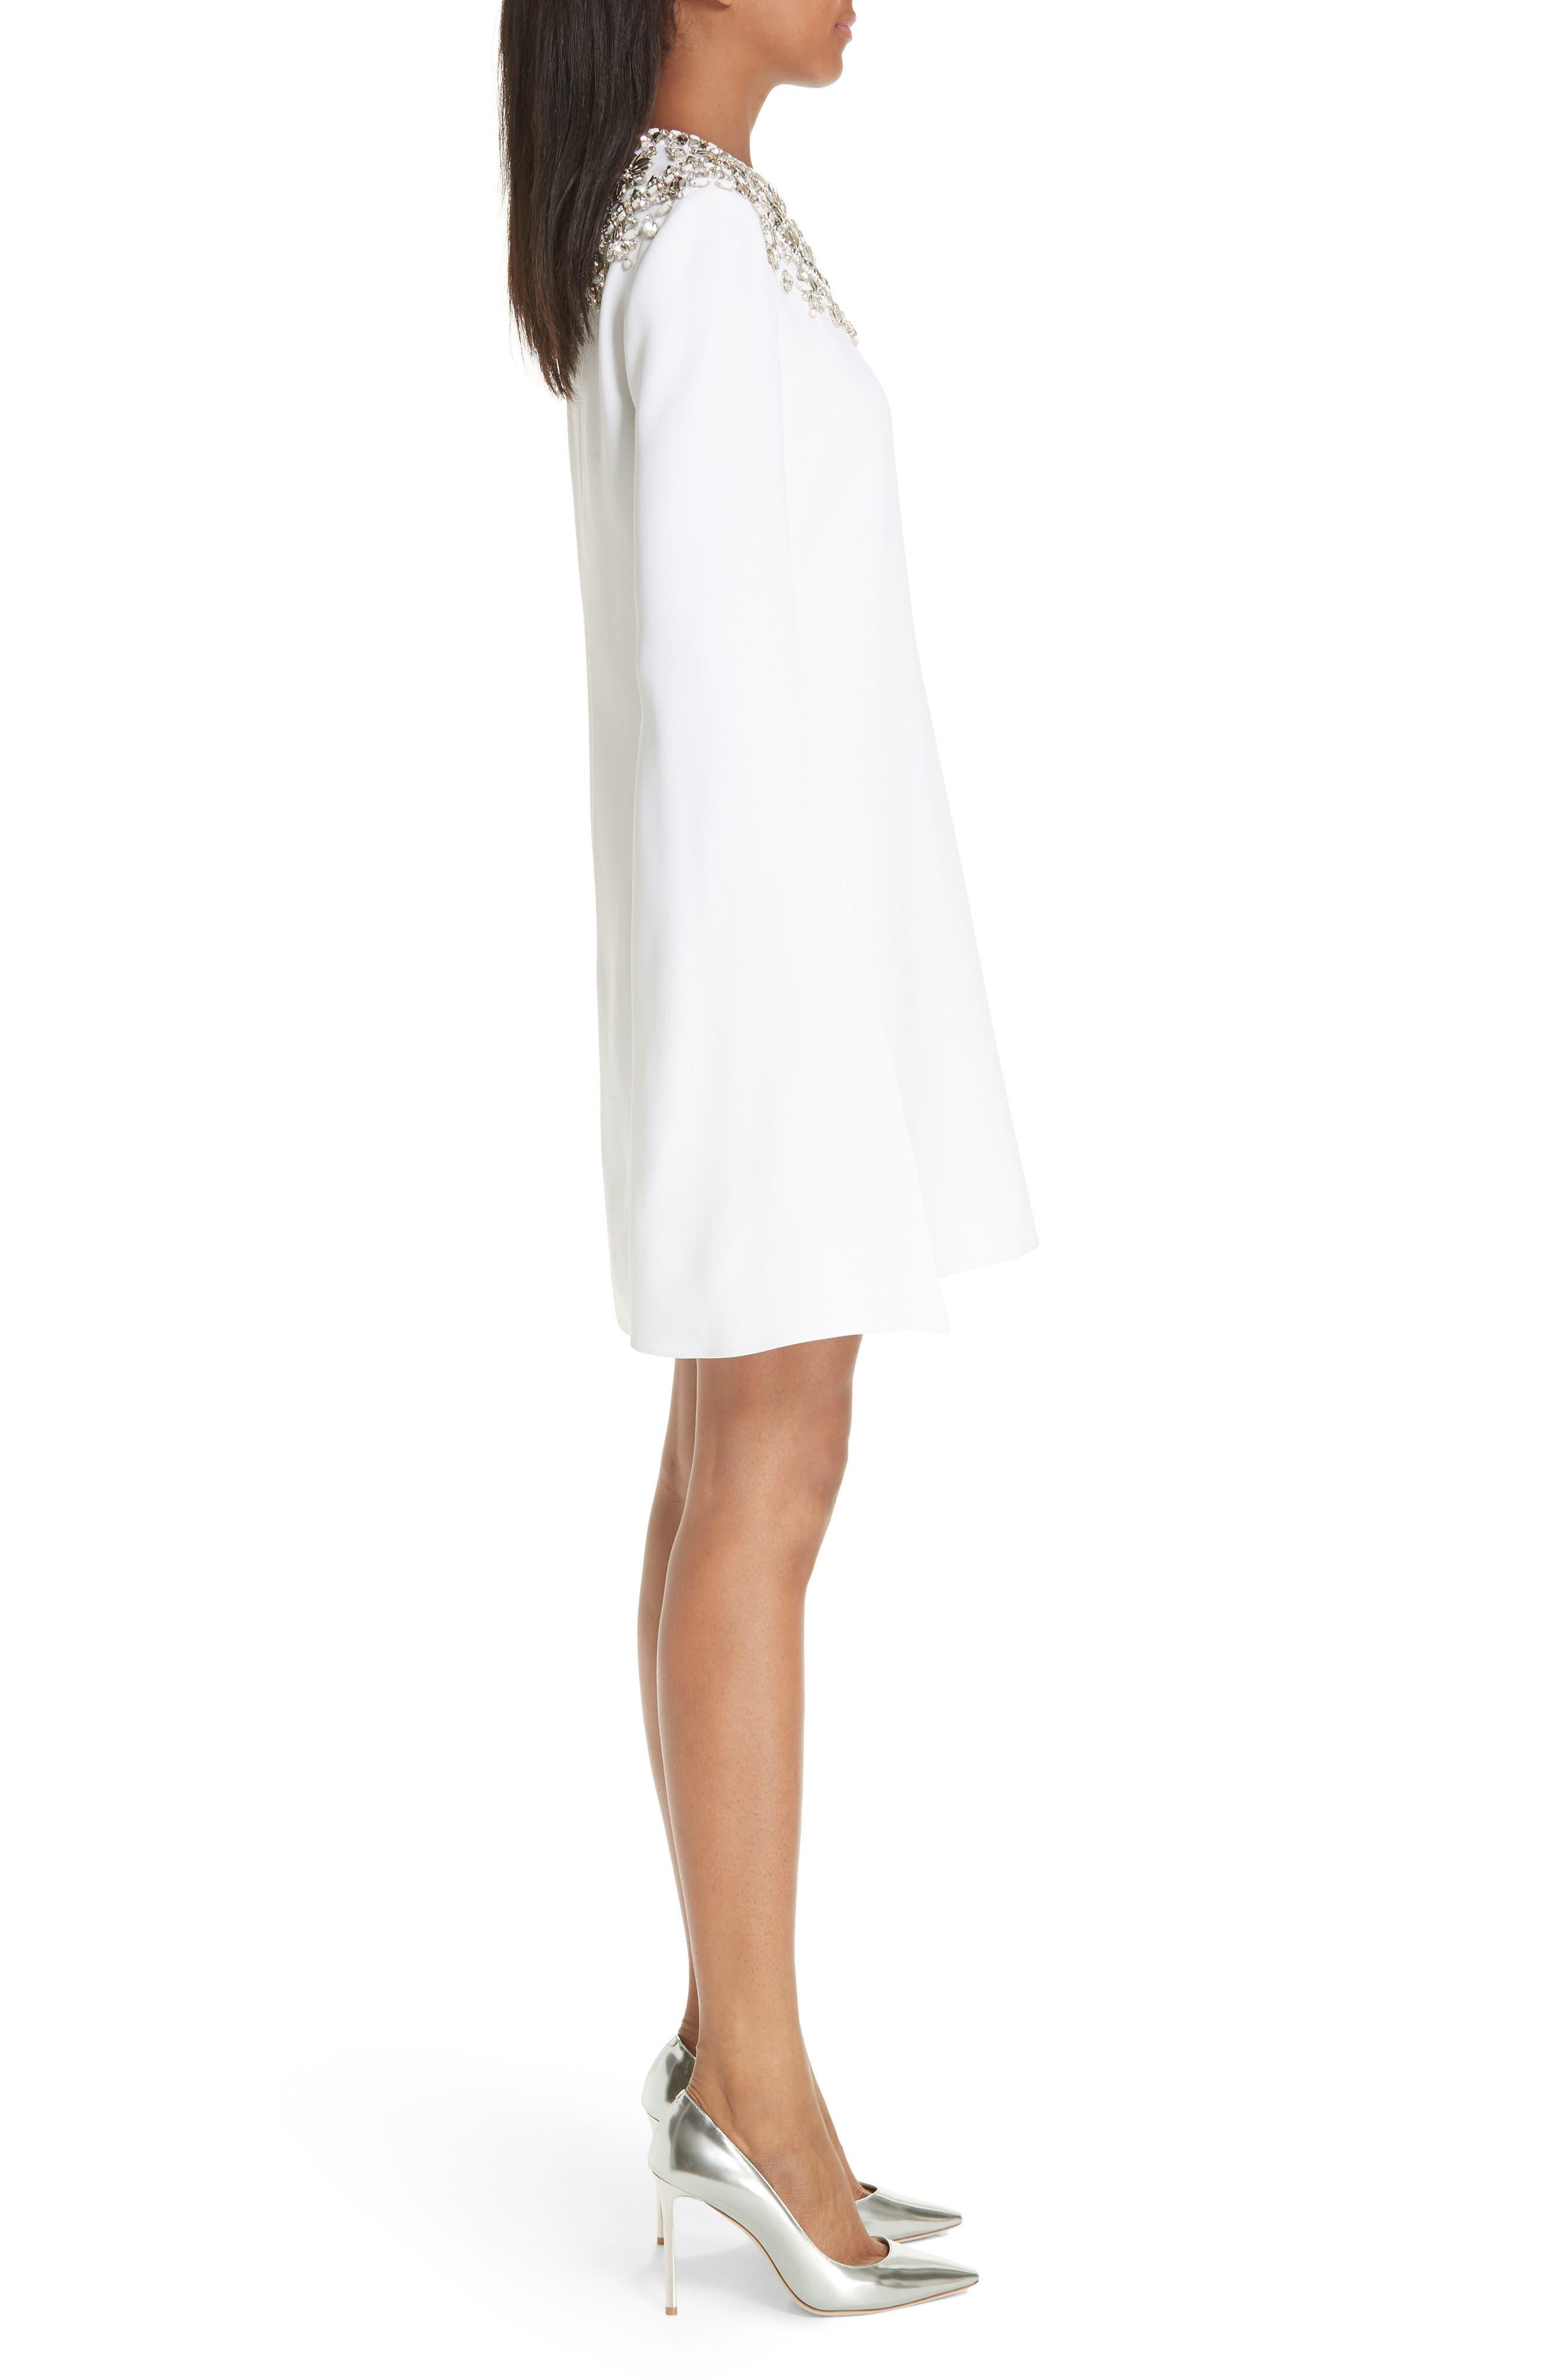 MICHAEL KORS, Crystal Embellished Split Sleeve Double Crepe Sable Dress, Alternate thumbnail 4, color, OPTIC WHITE W/ SILVER